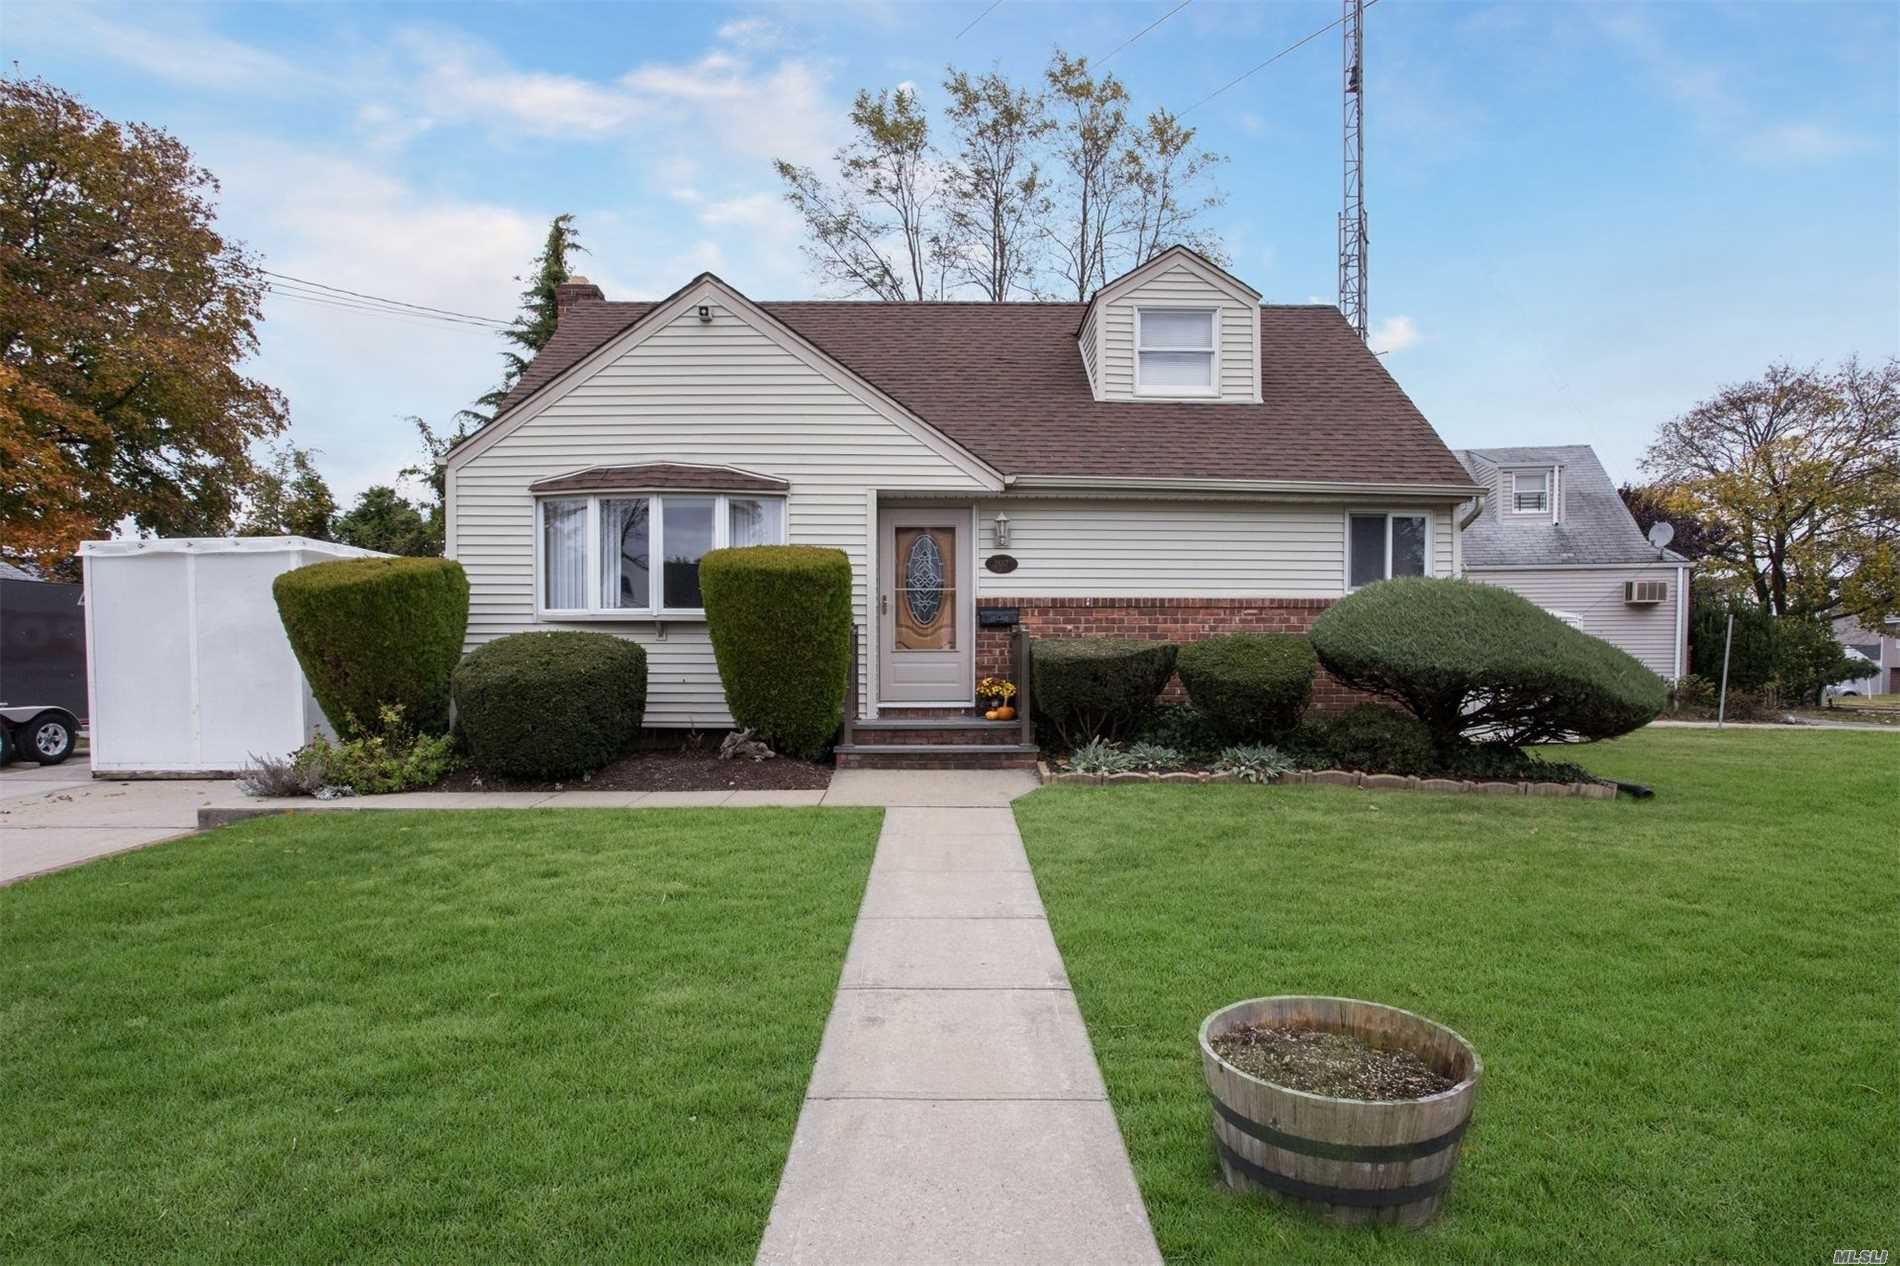 2667 Cedar Ln - N. Bellmore, New York